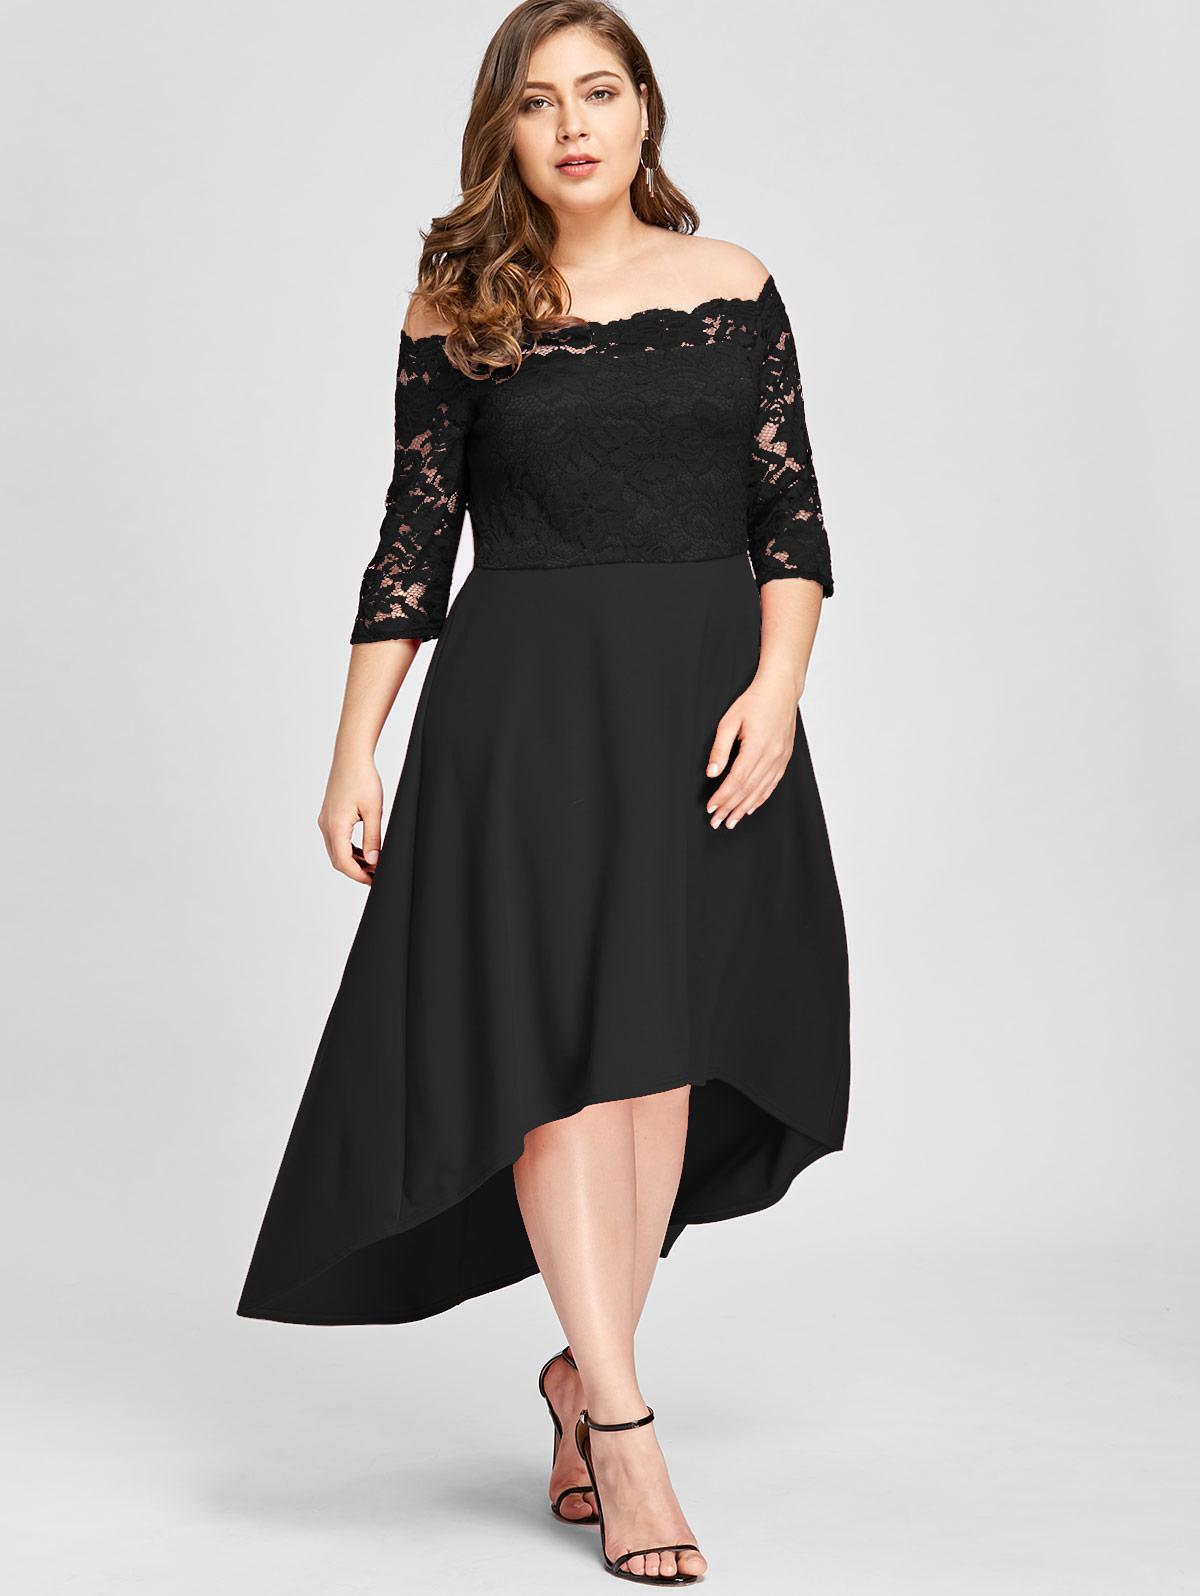 Gamiss Women Party Dress Plus Size Off Shoulder Dip Hem Lace 34 Length Sleeves Dress Asymmetrical Elegant Vestidos Big Size 5xl Dressess Woman Dress